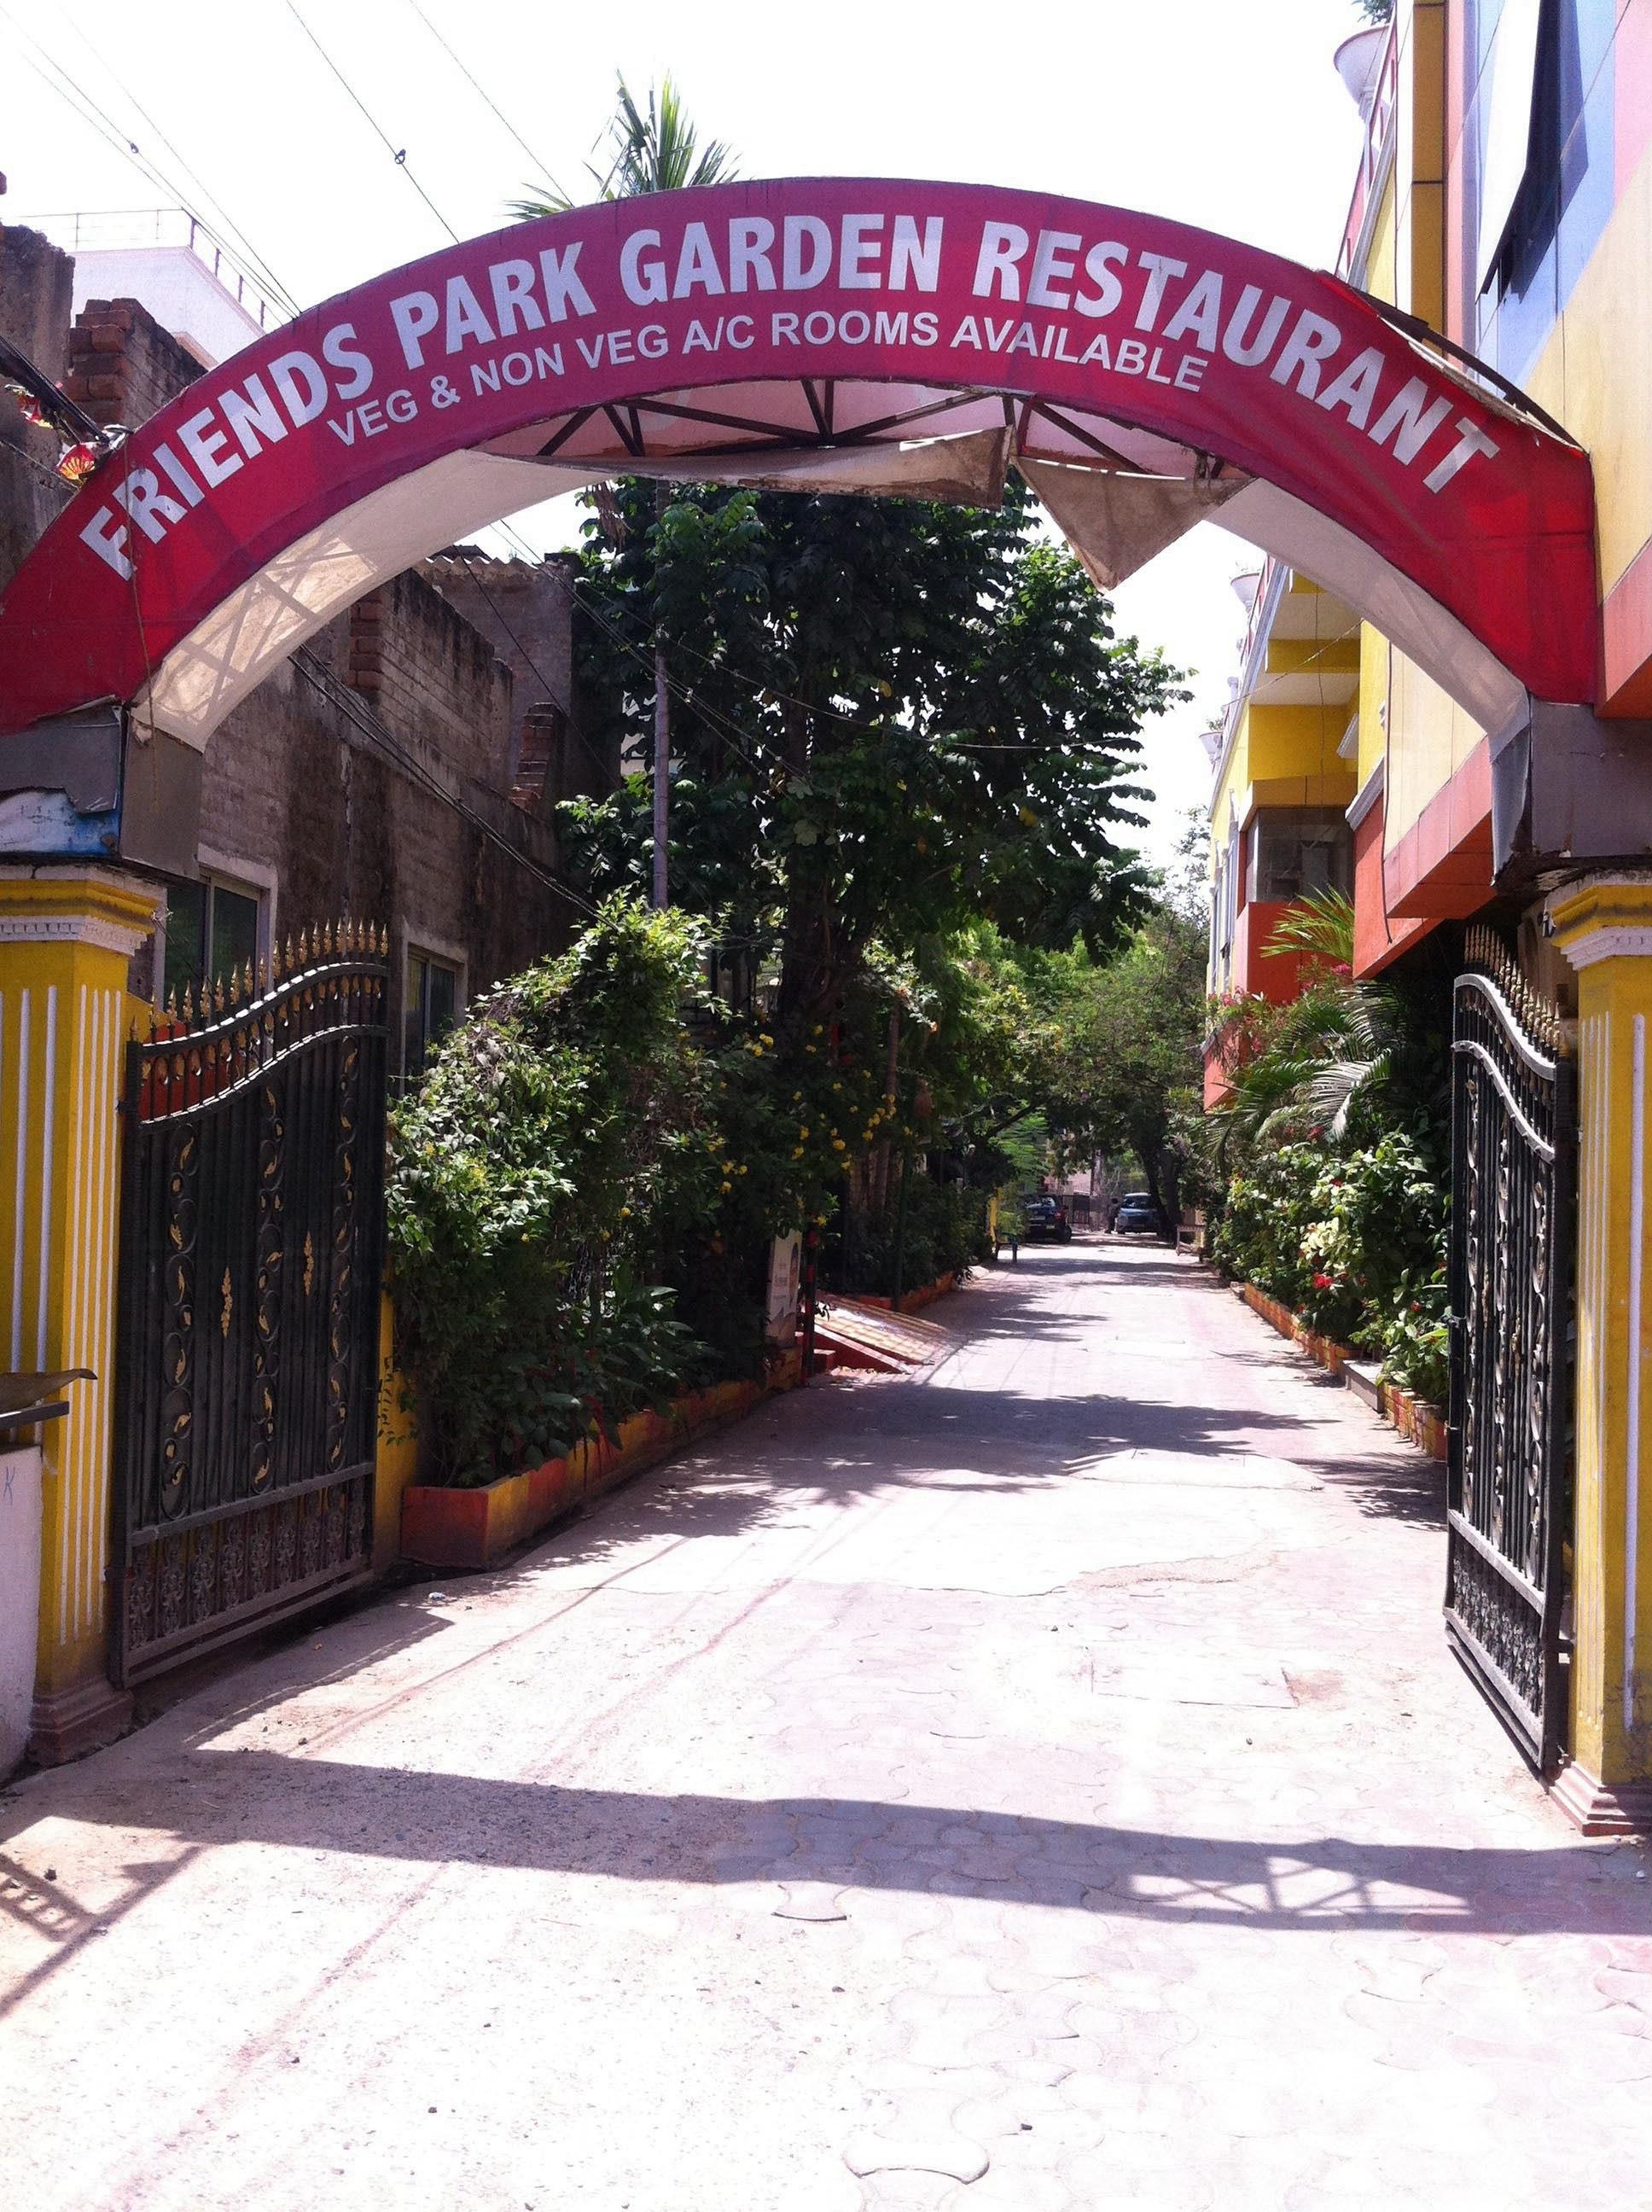 Friends Park Garden - Valasaravakkam - Chennai Image